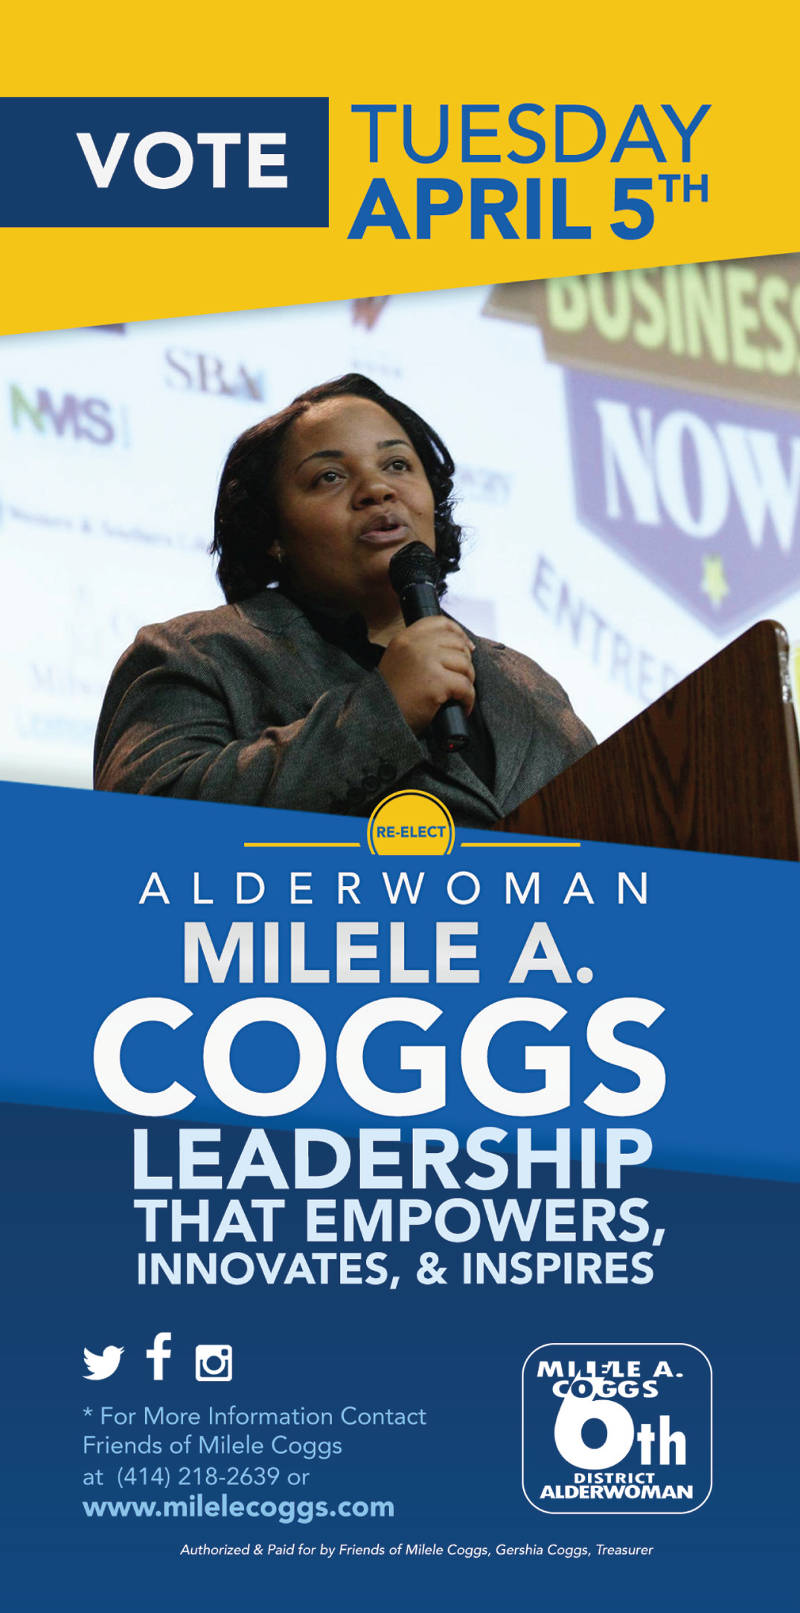 vote-april-5-alderwoman-milele-a-coggs-leadership-empowers-innovates-inspires